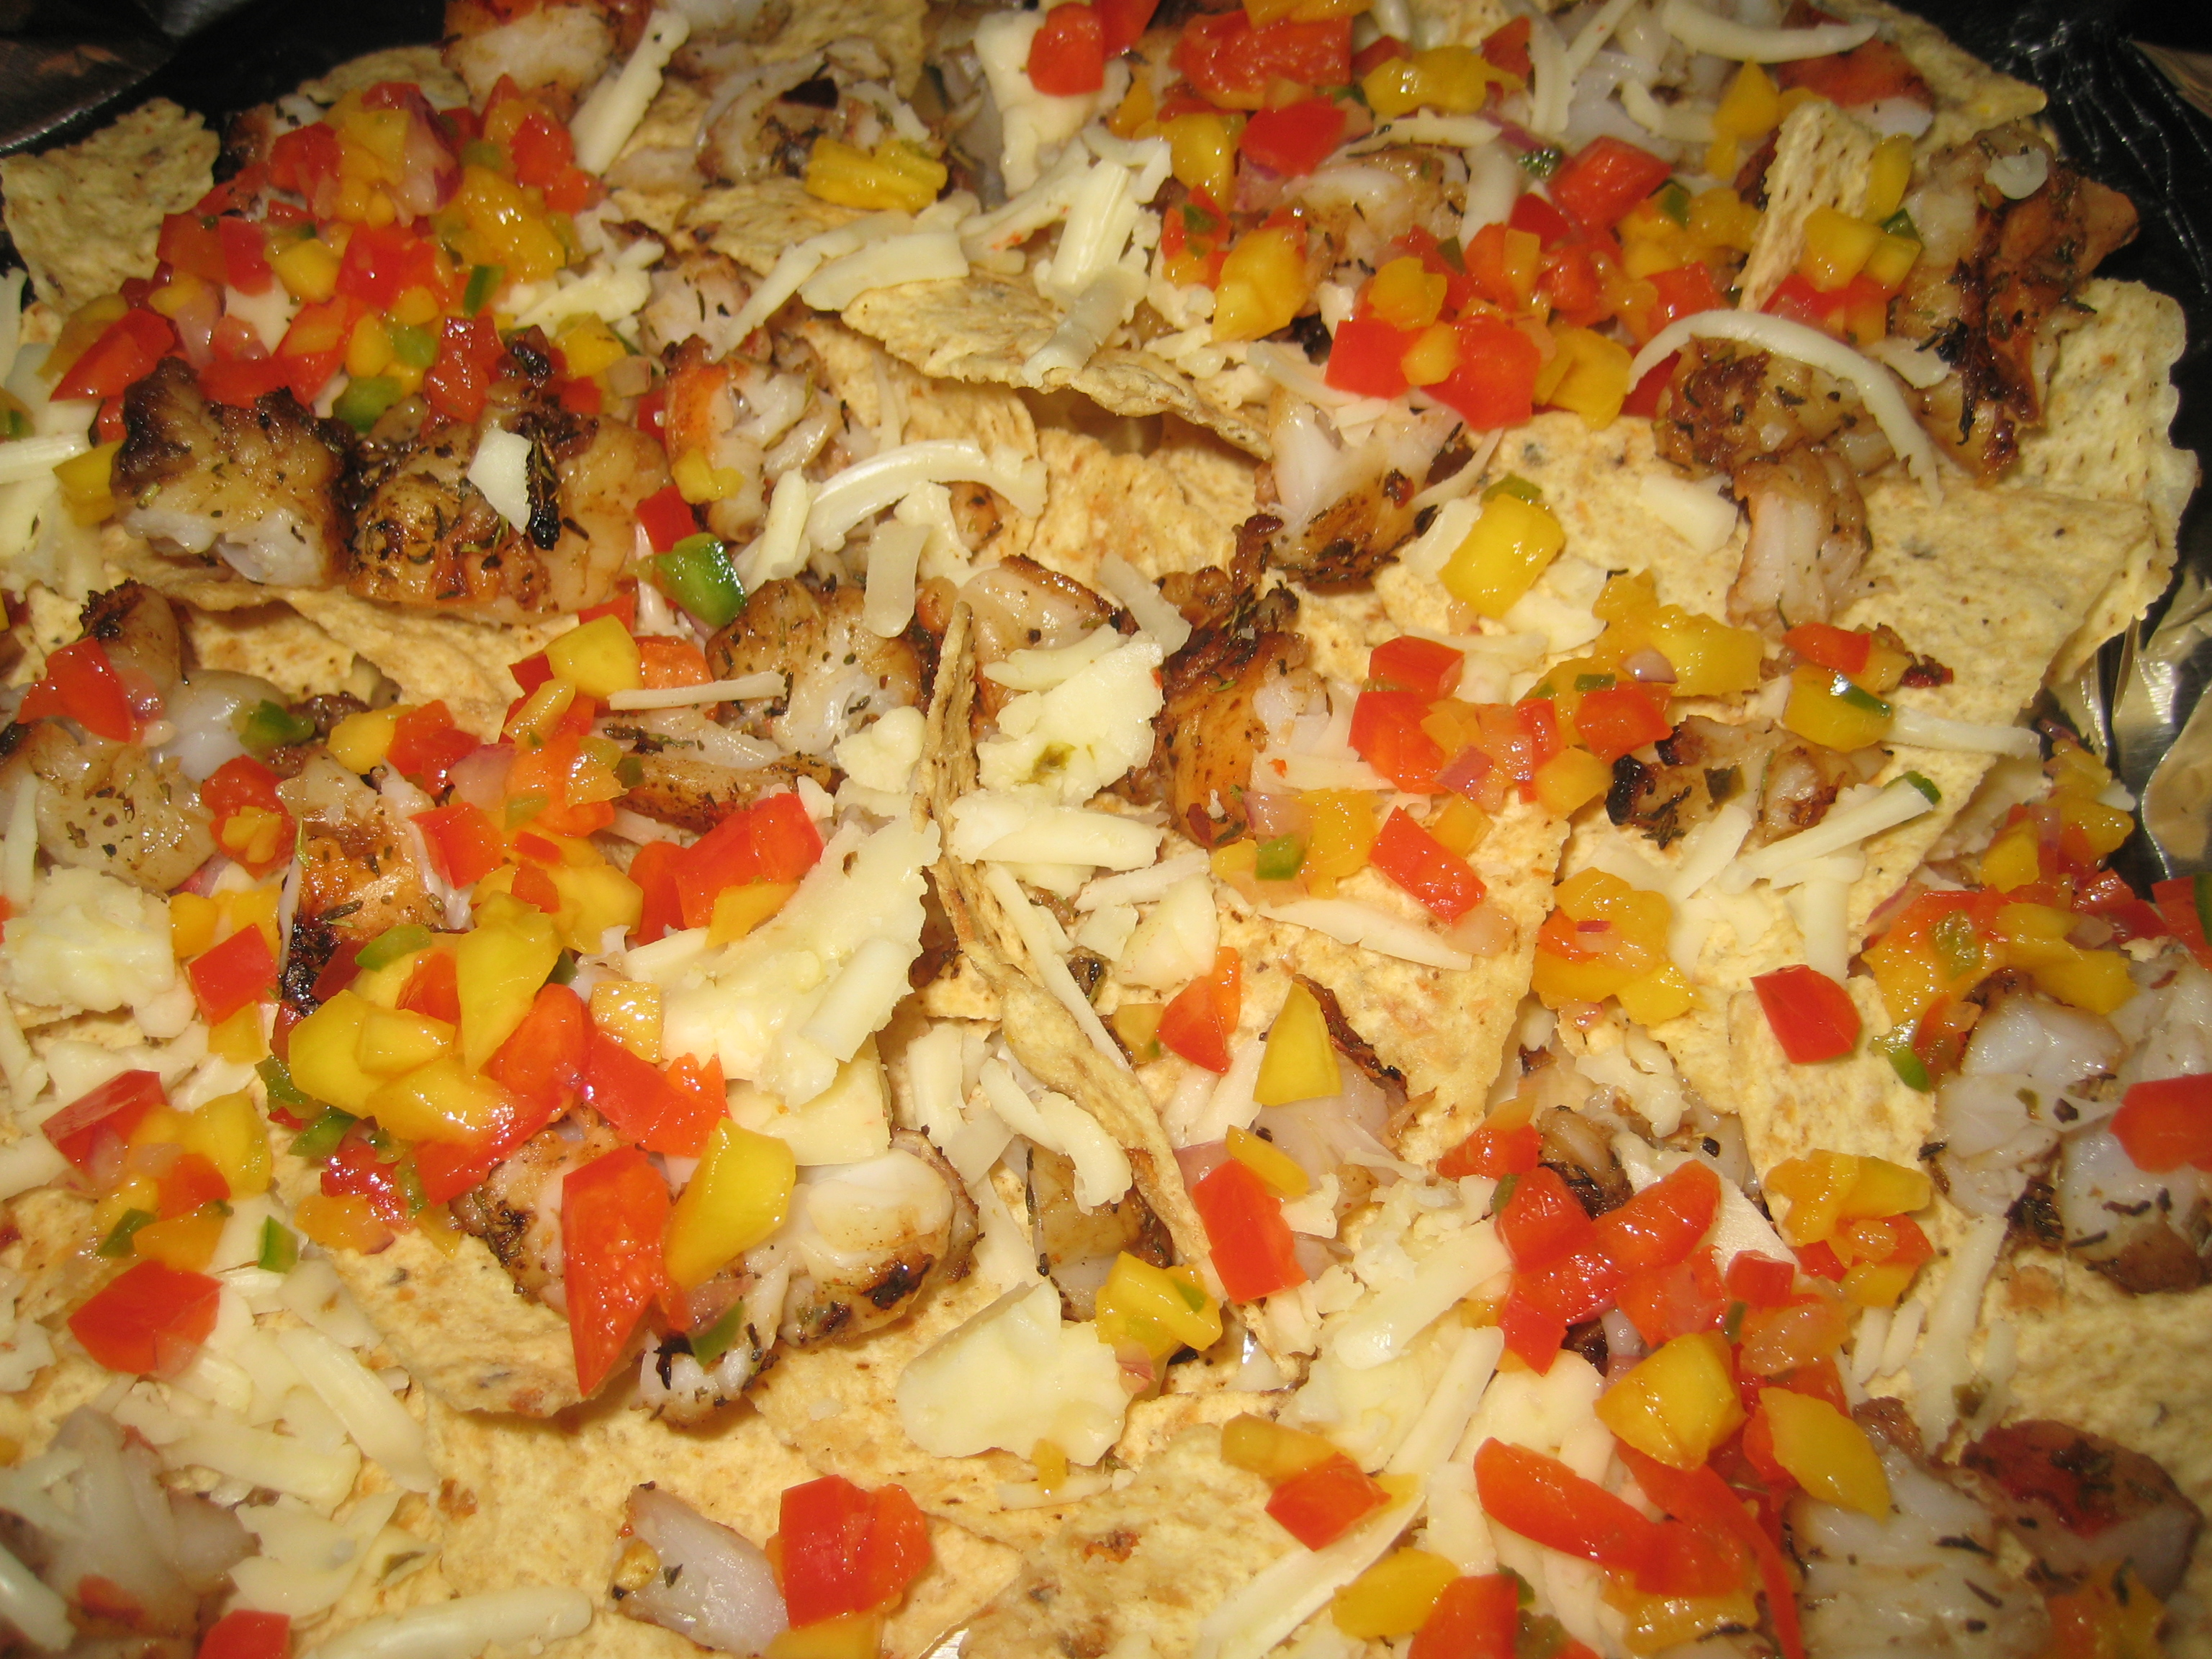 Building the nachos.